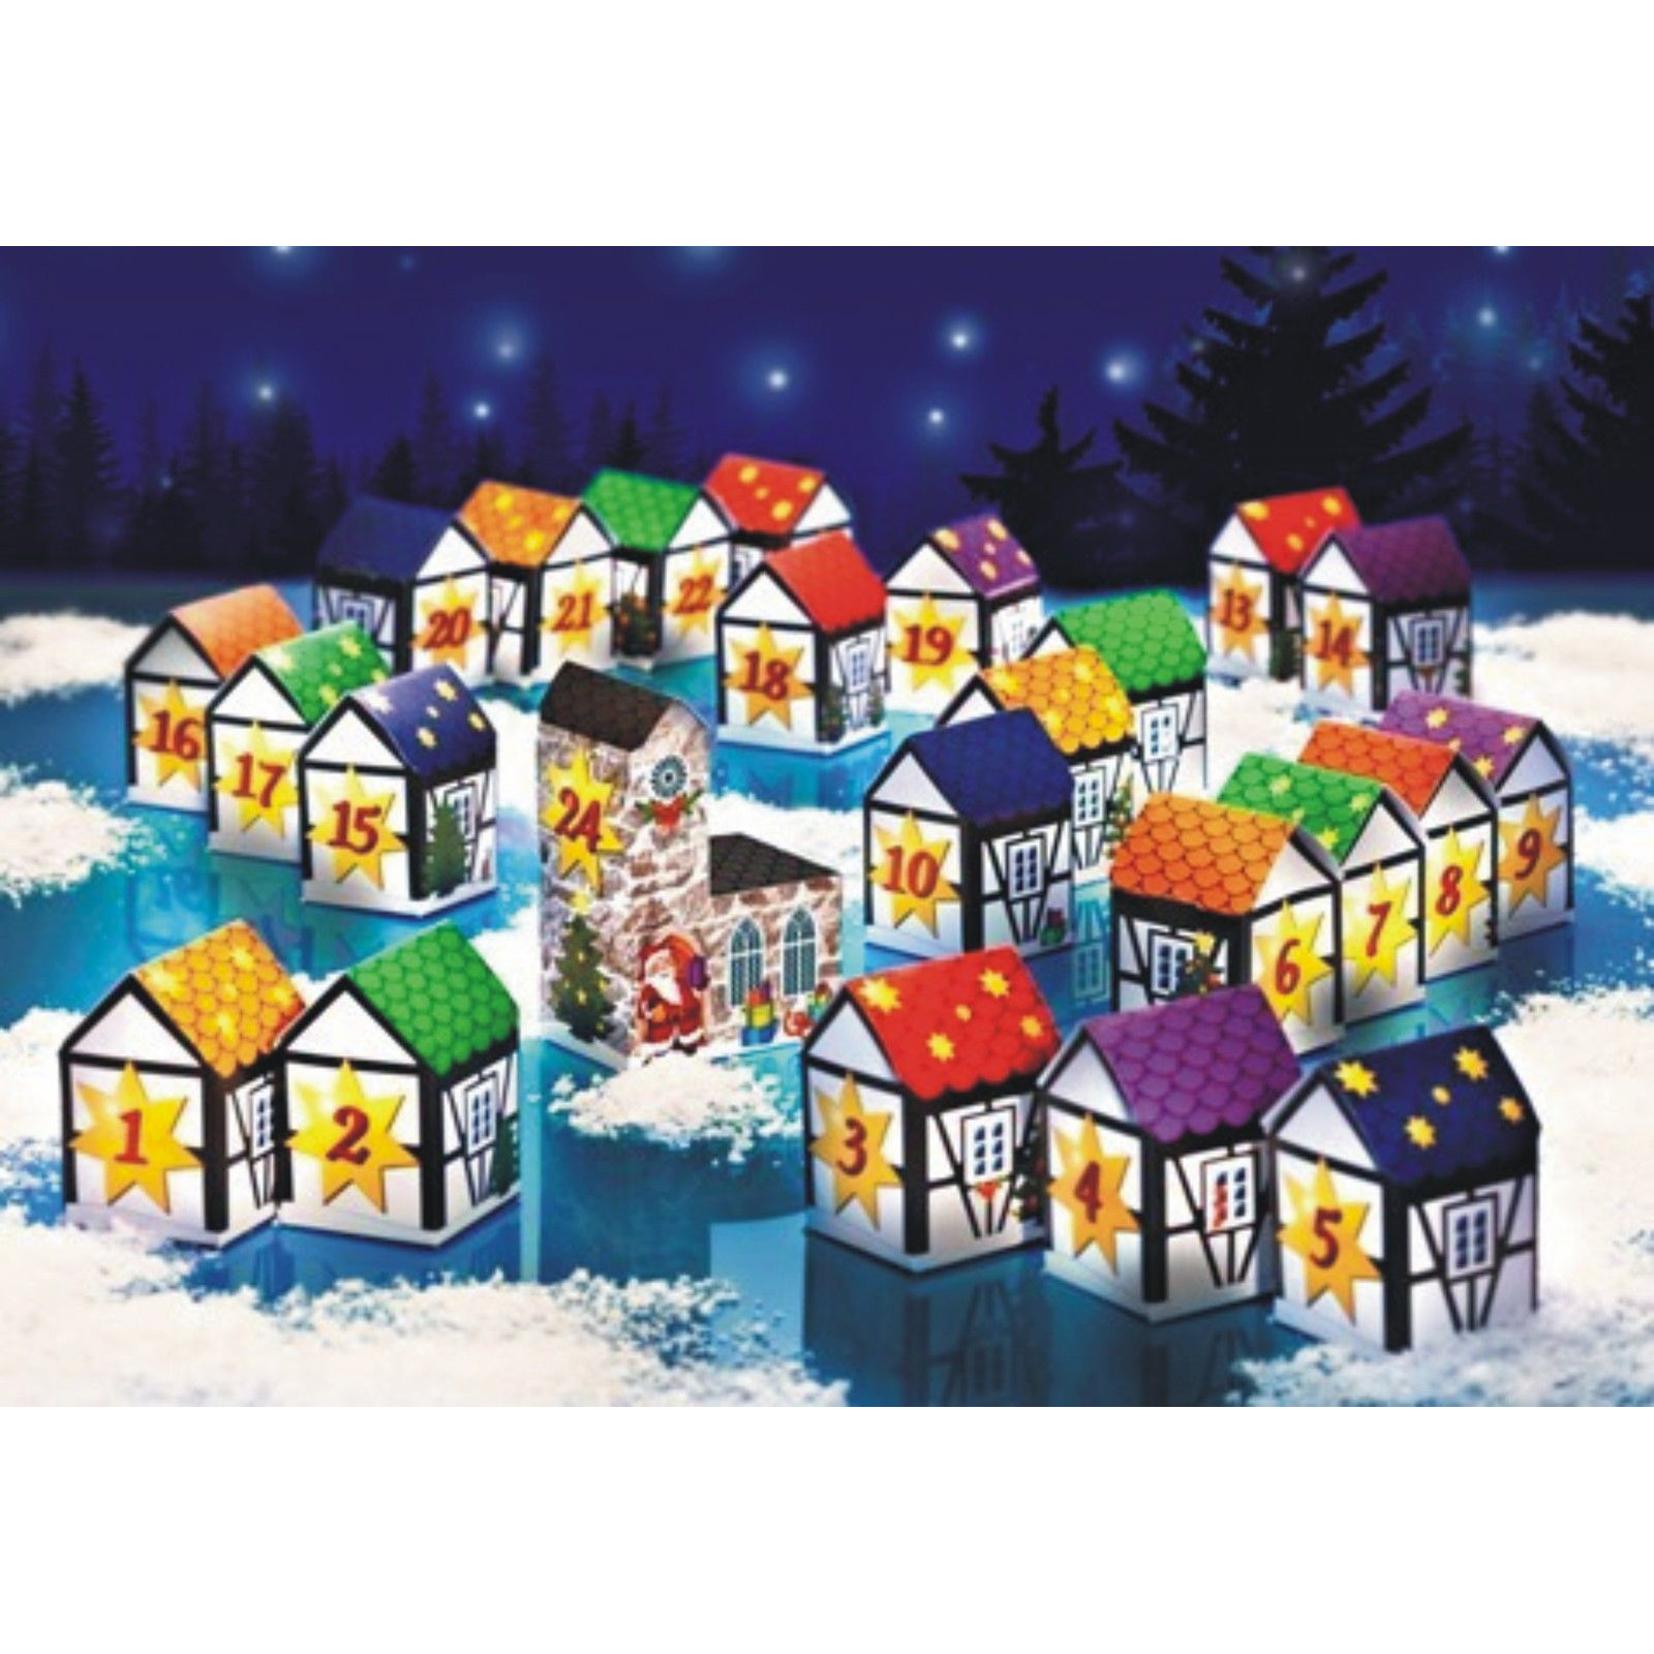 wenko adventskalender dorf 24 teilig zum selbst bef llen papier adventkalender ebay. Black Bedroom Furniture Sets. Home Design Ideas